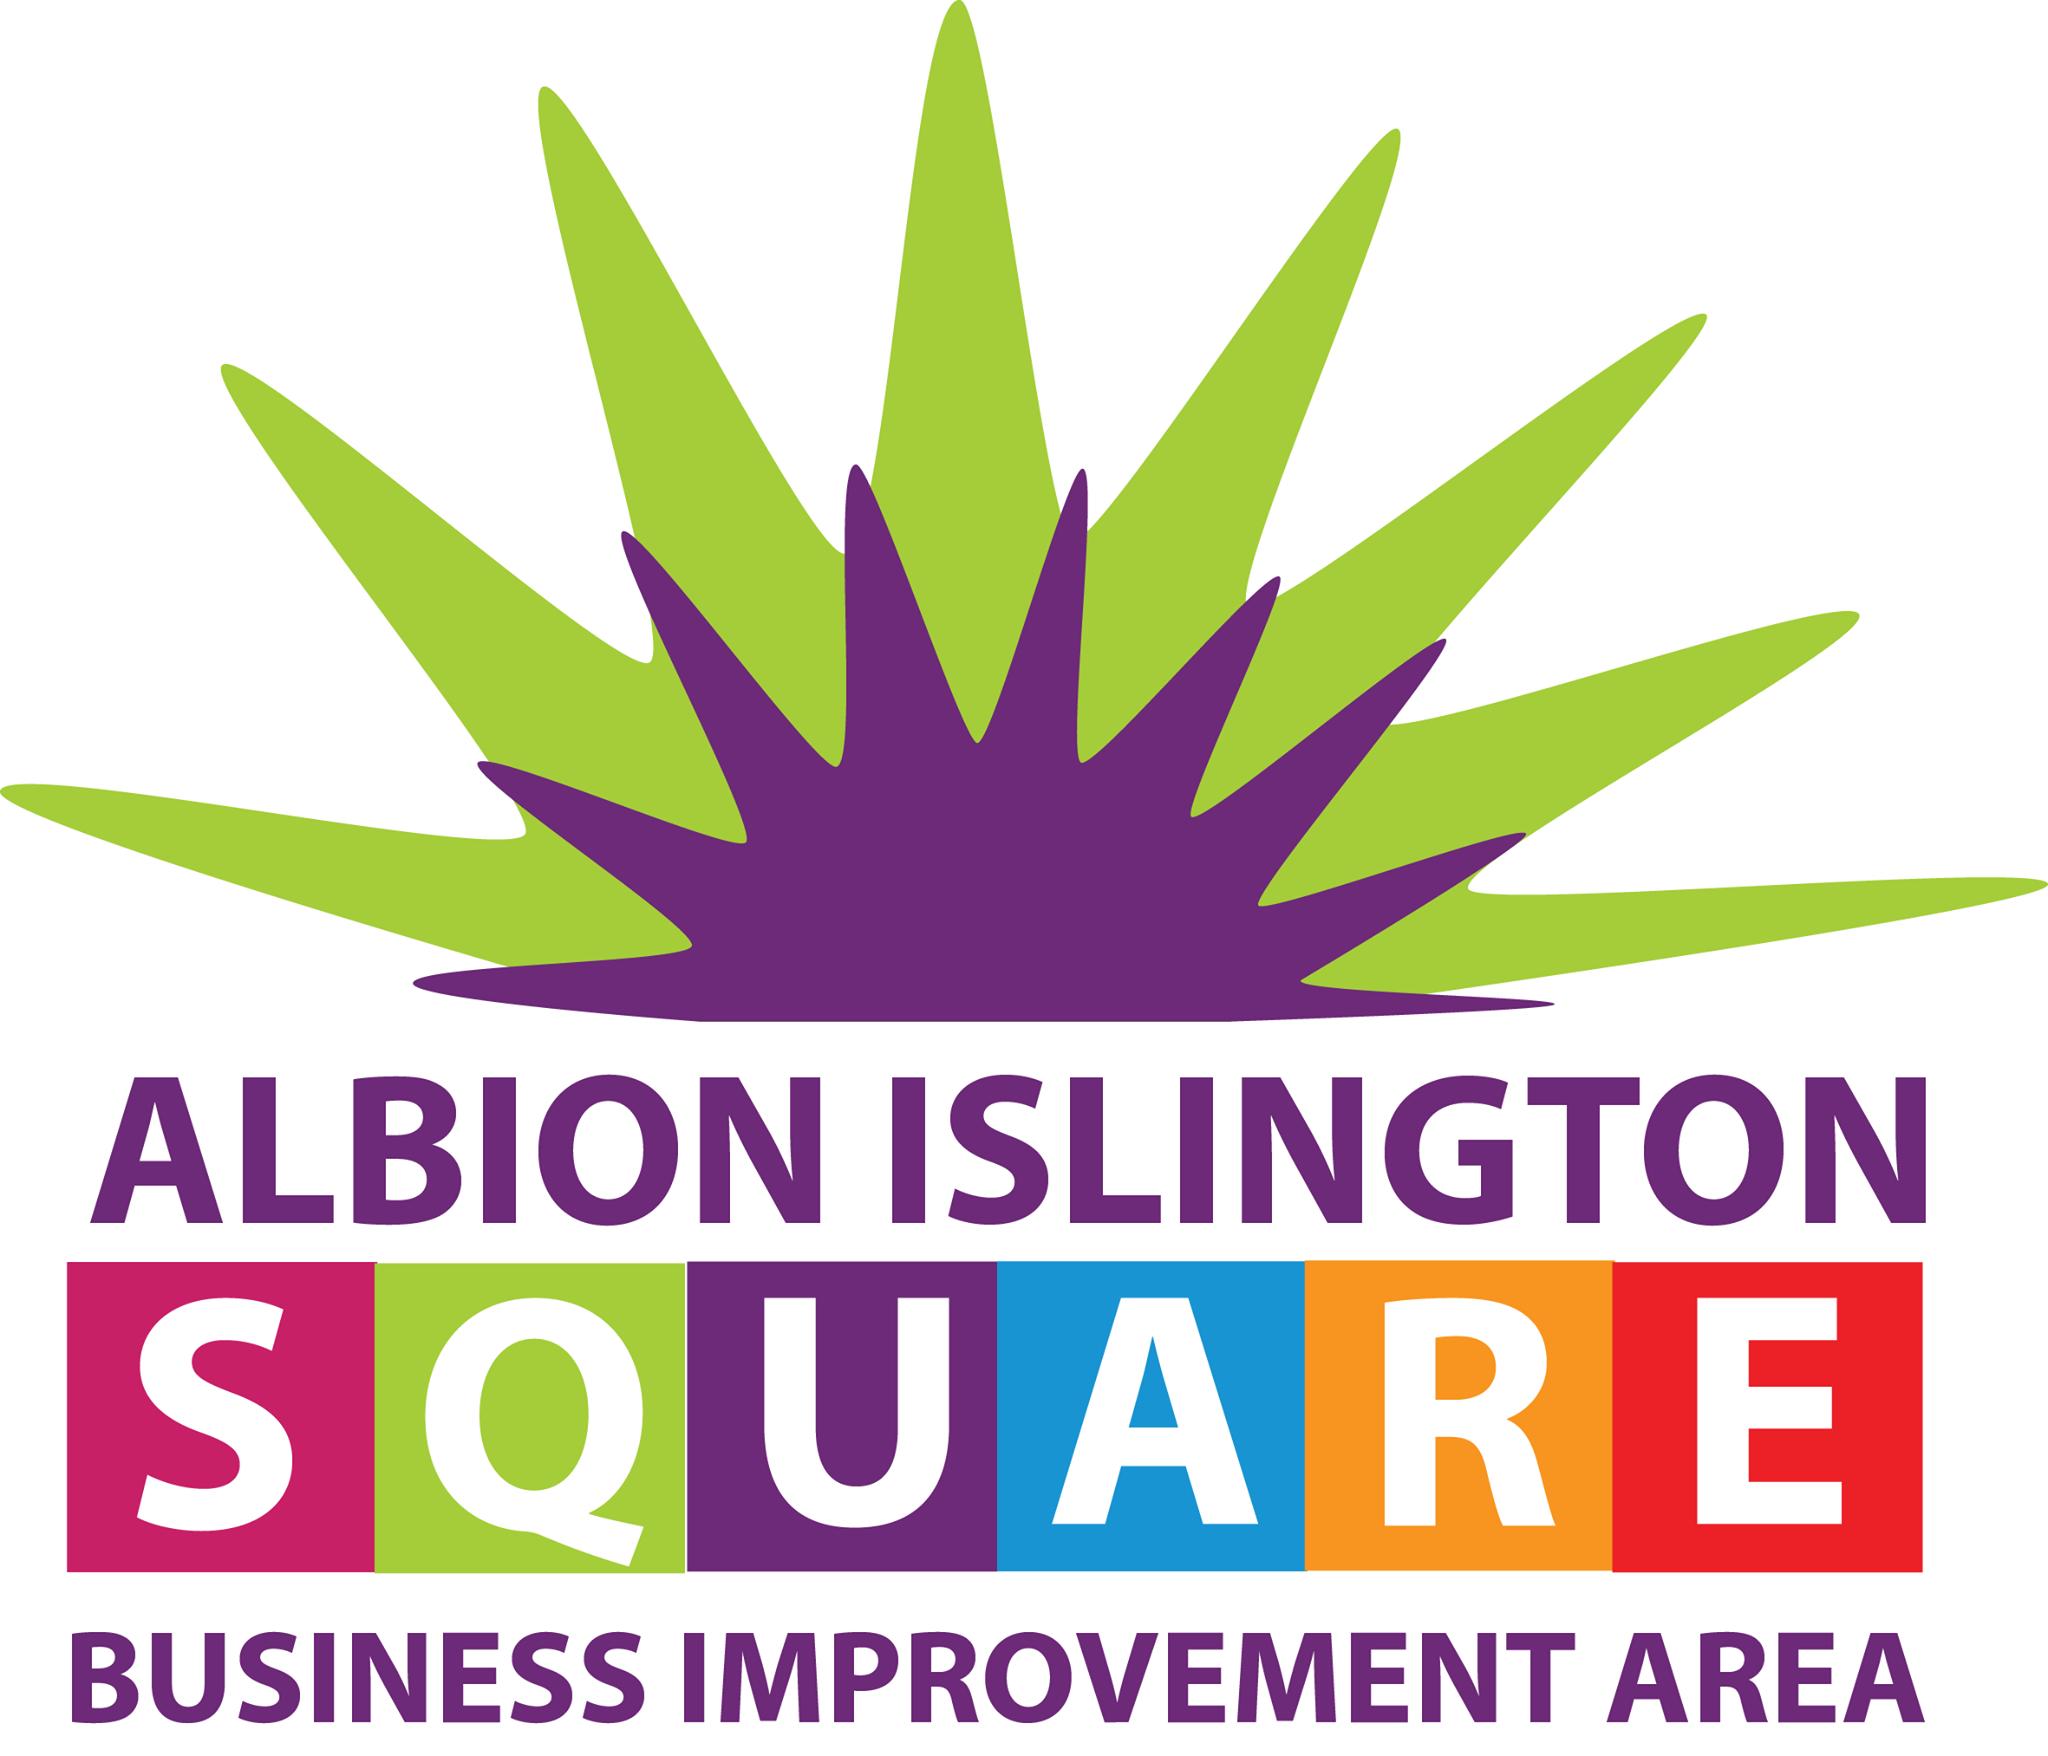 Albion Islington Sq